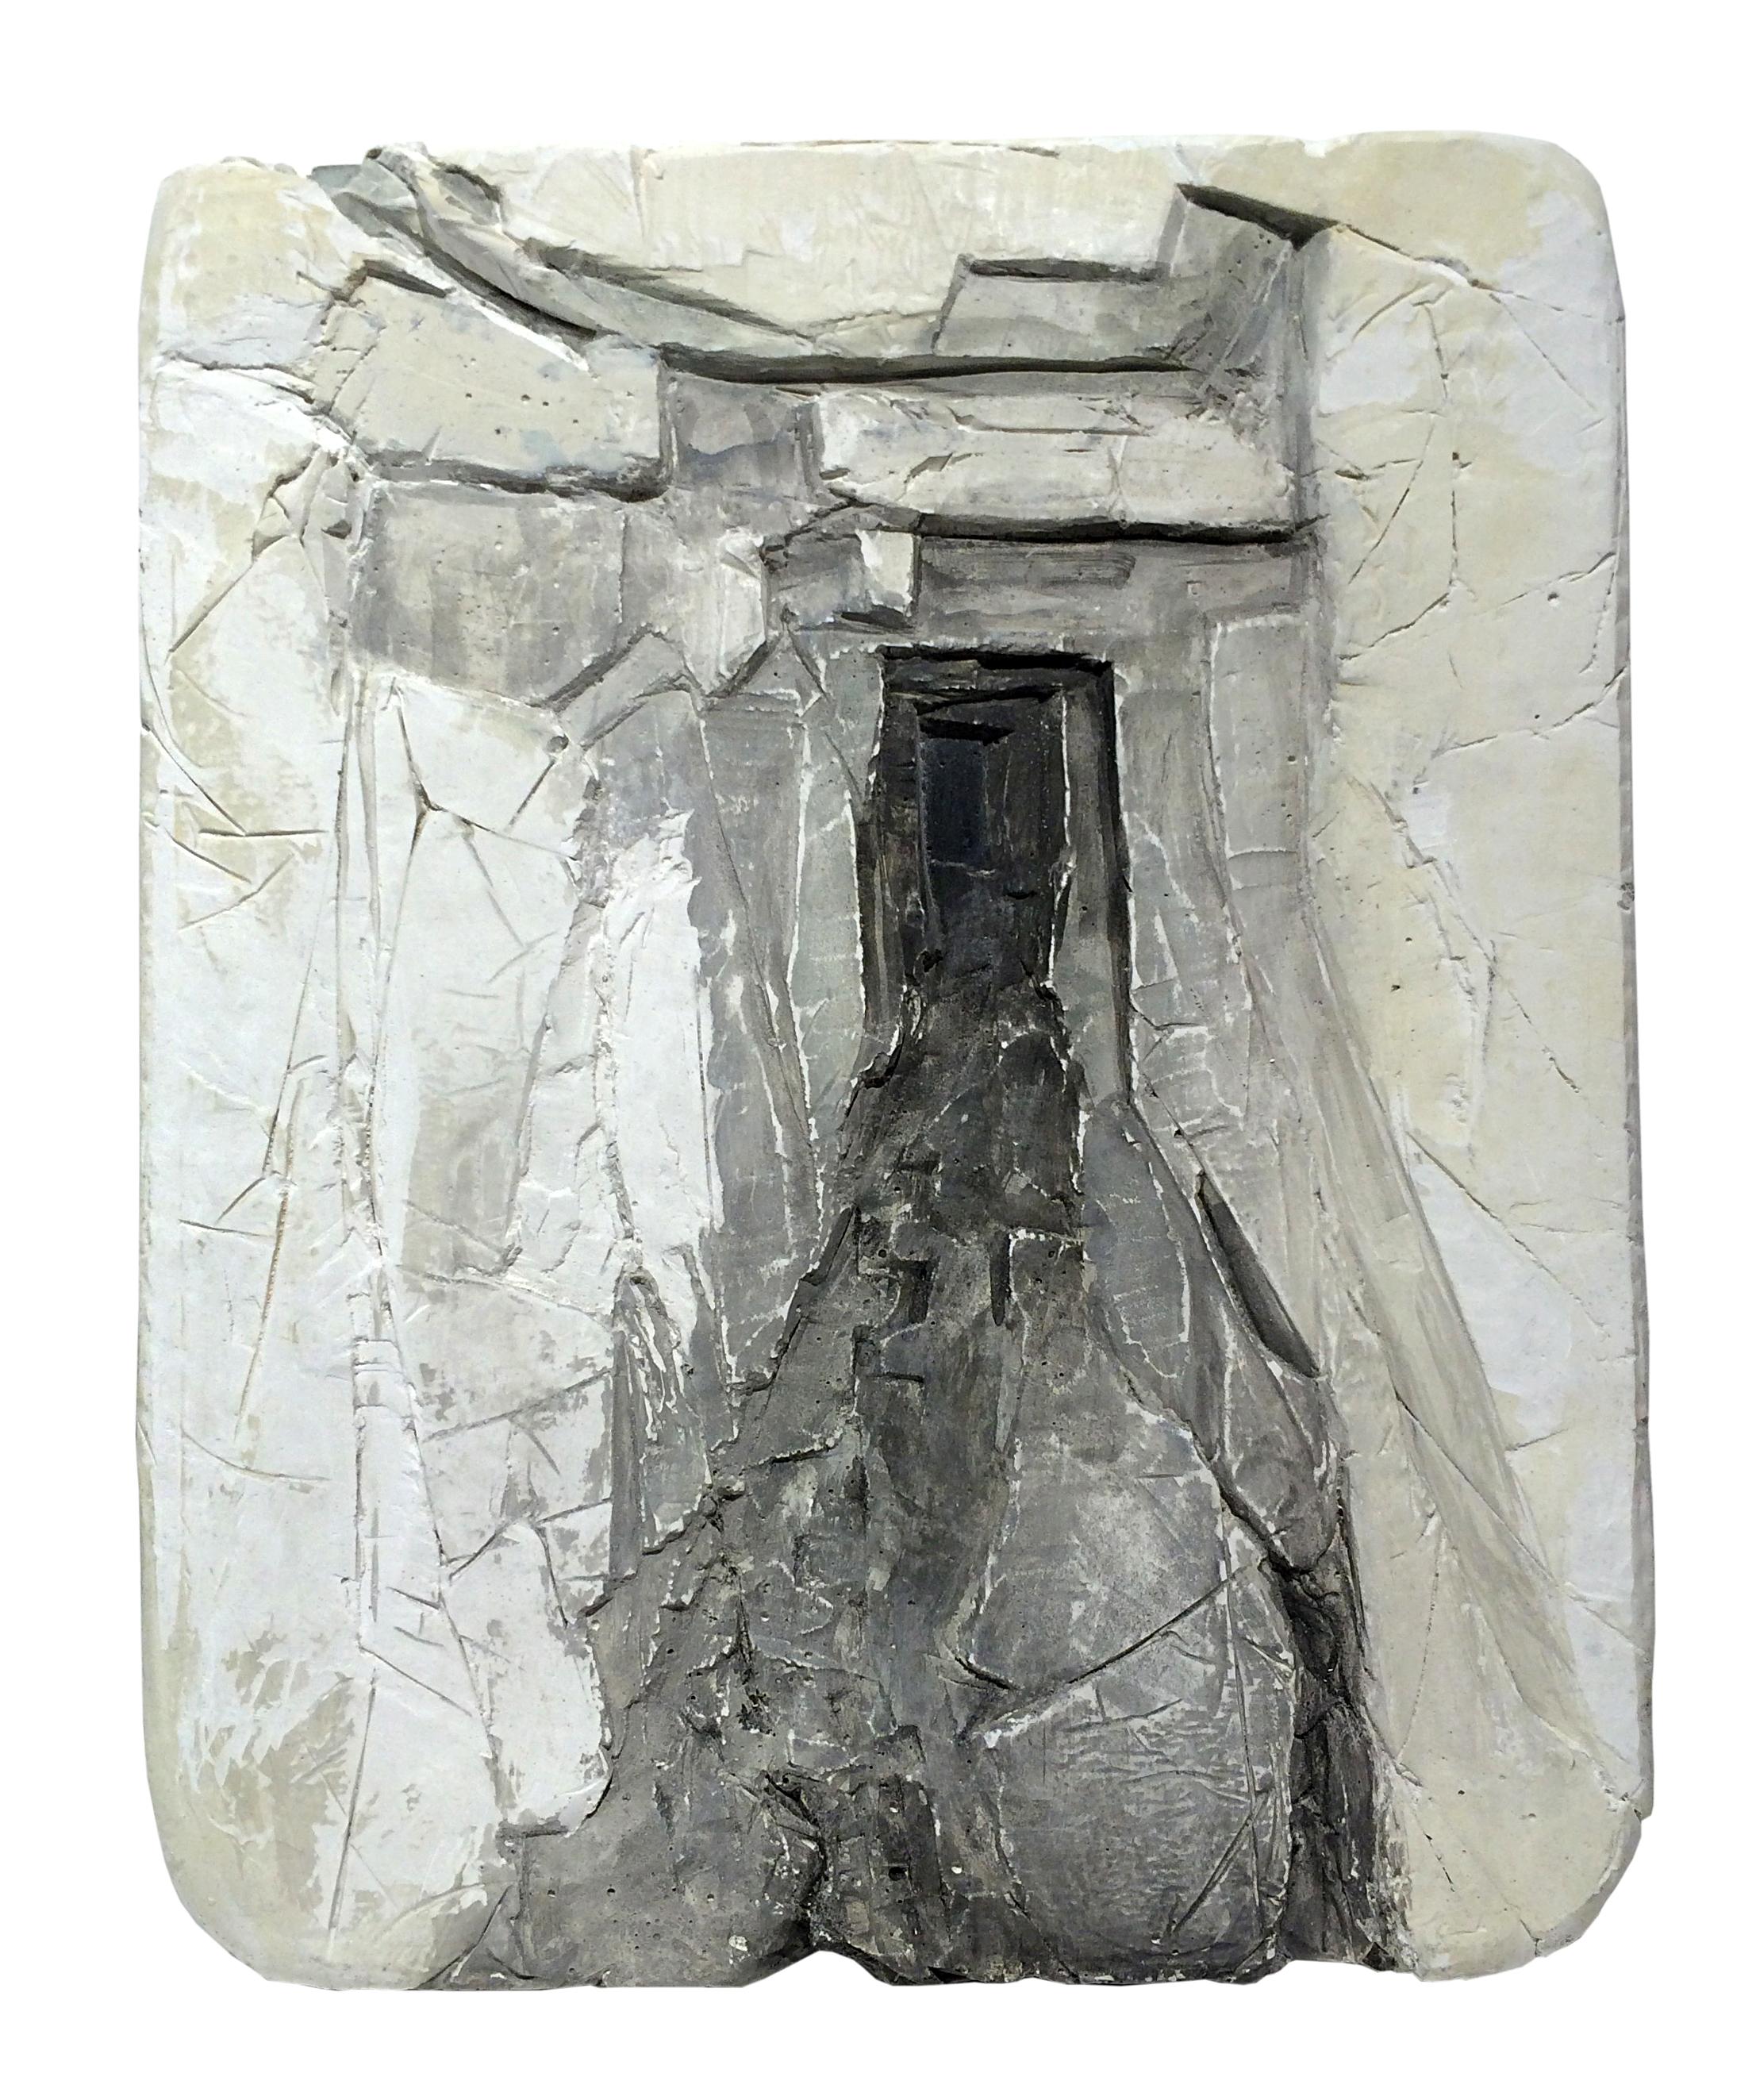 Tunnel – trench warfare, 2015